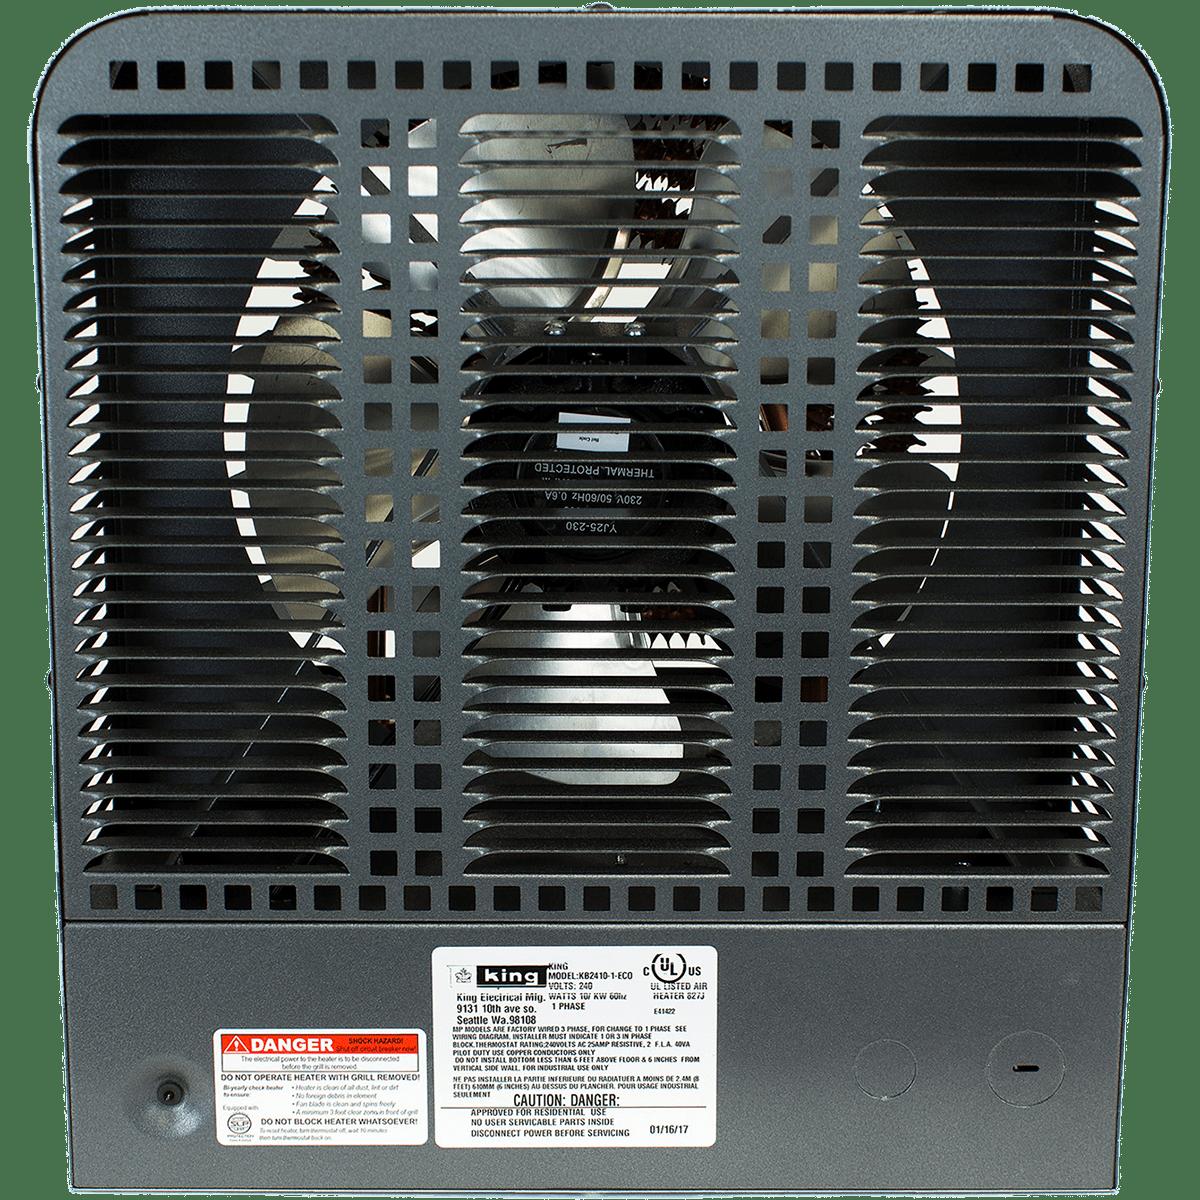 King Electric 240v Garage Heaters Kb Series Sylvane Heater Wiring Diagram Bathroom Electrical